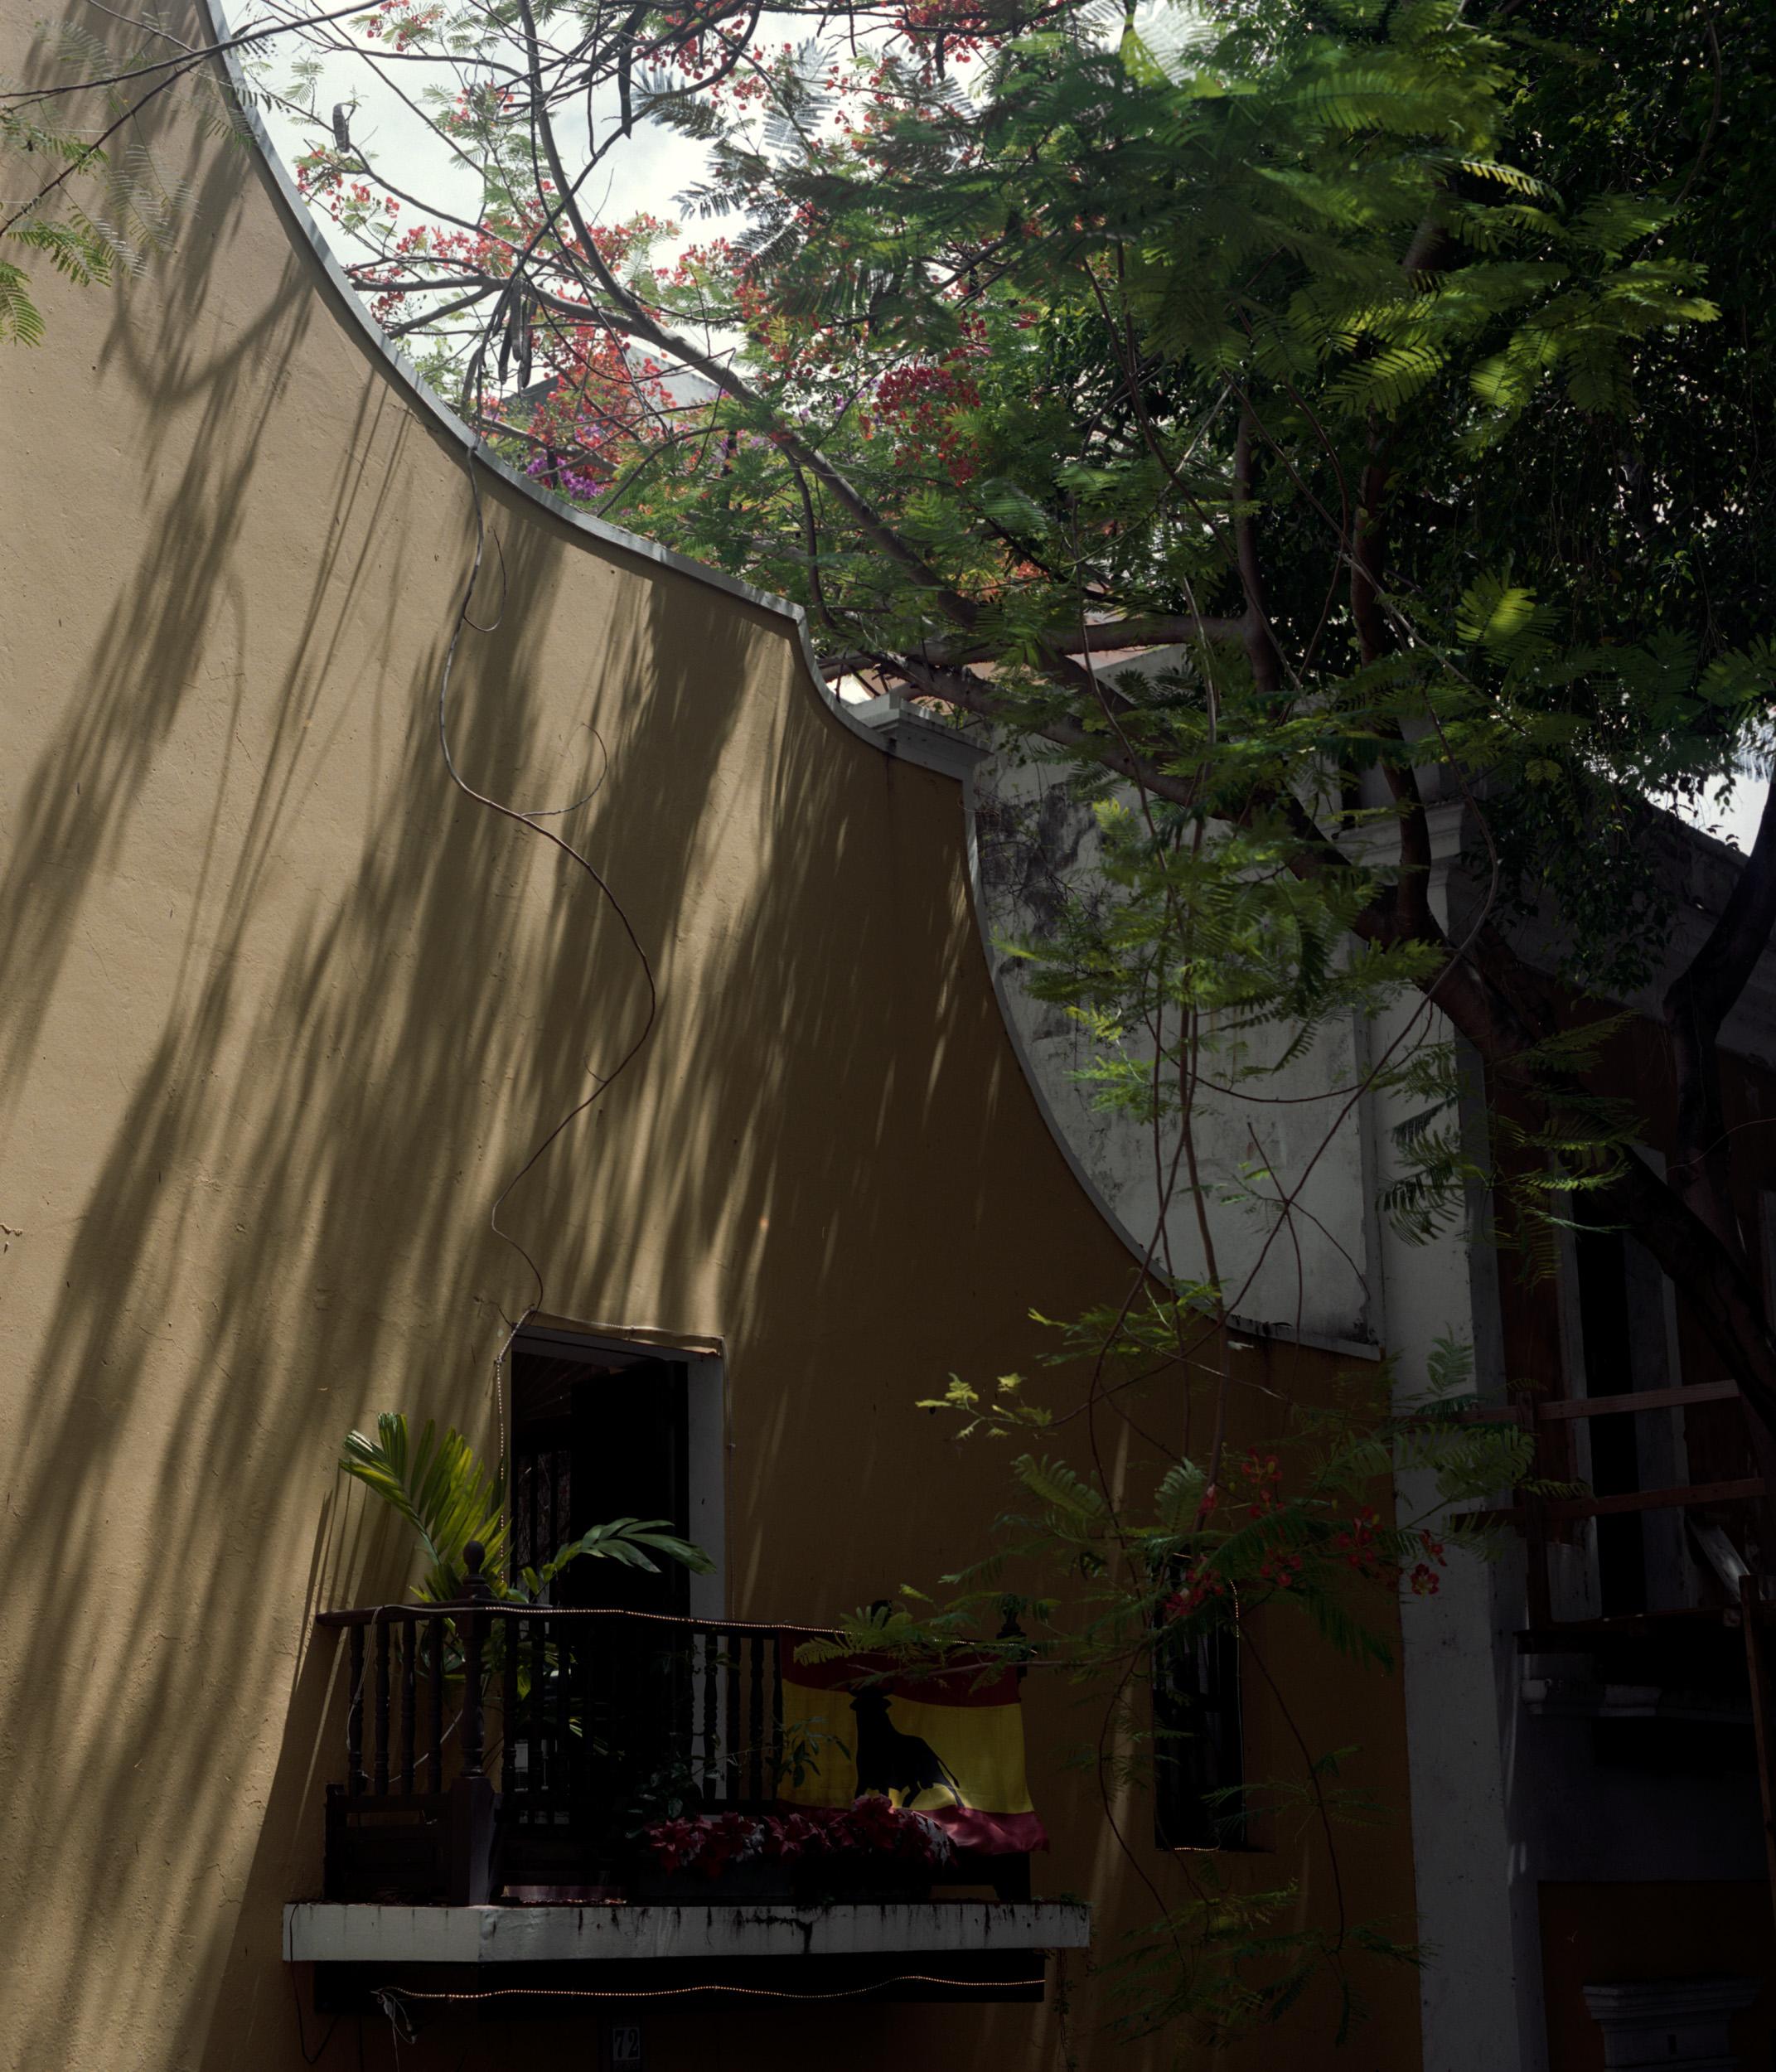 Puerto Rico056.jpg